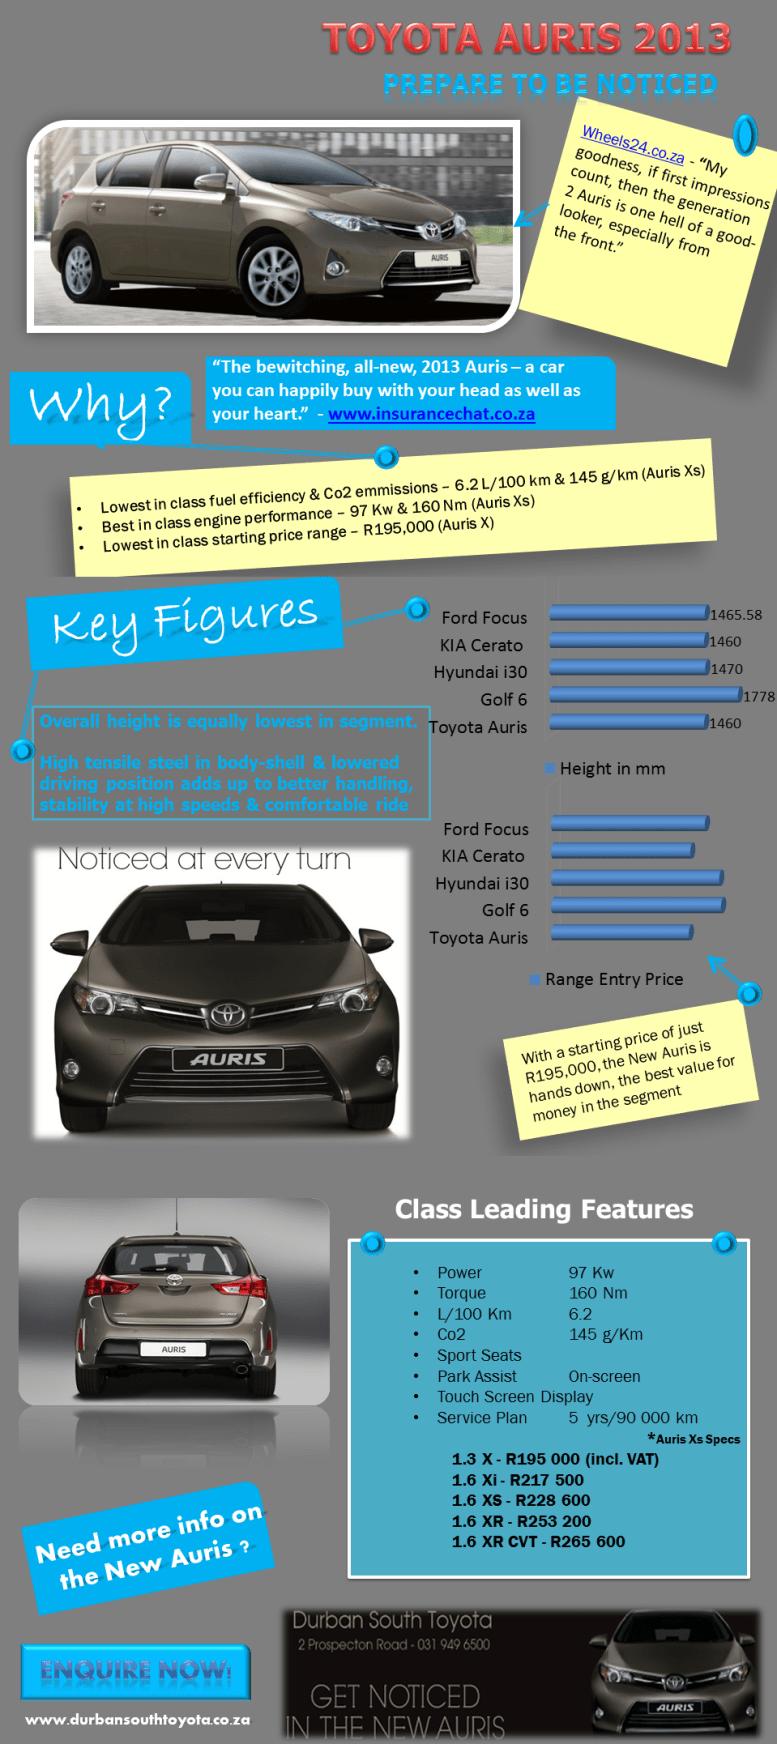 Toyota Auris 2013 Infographic